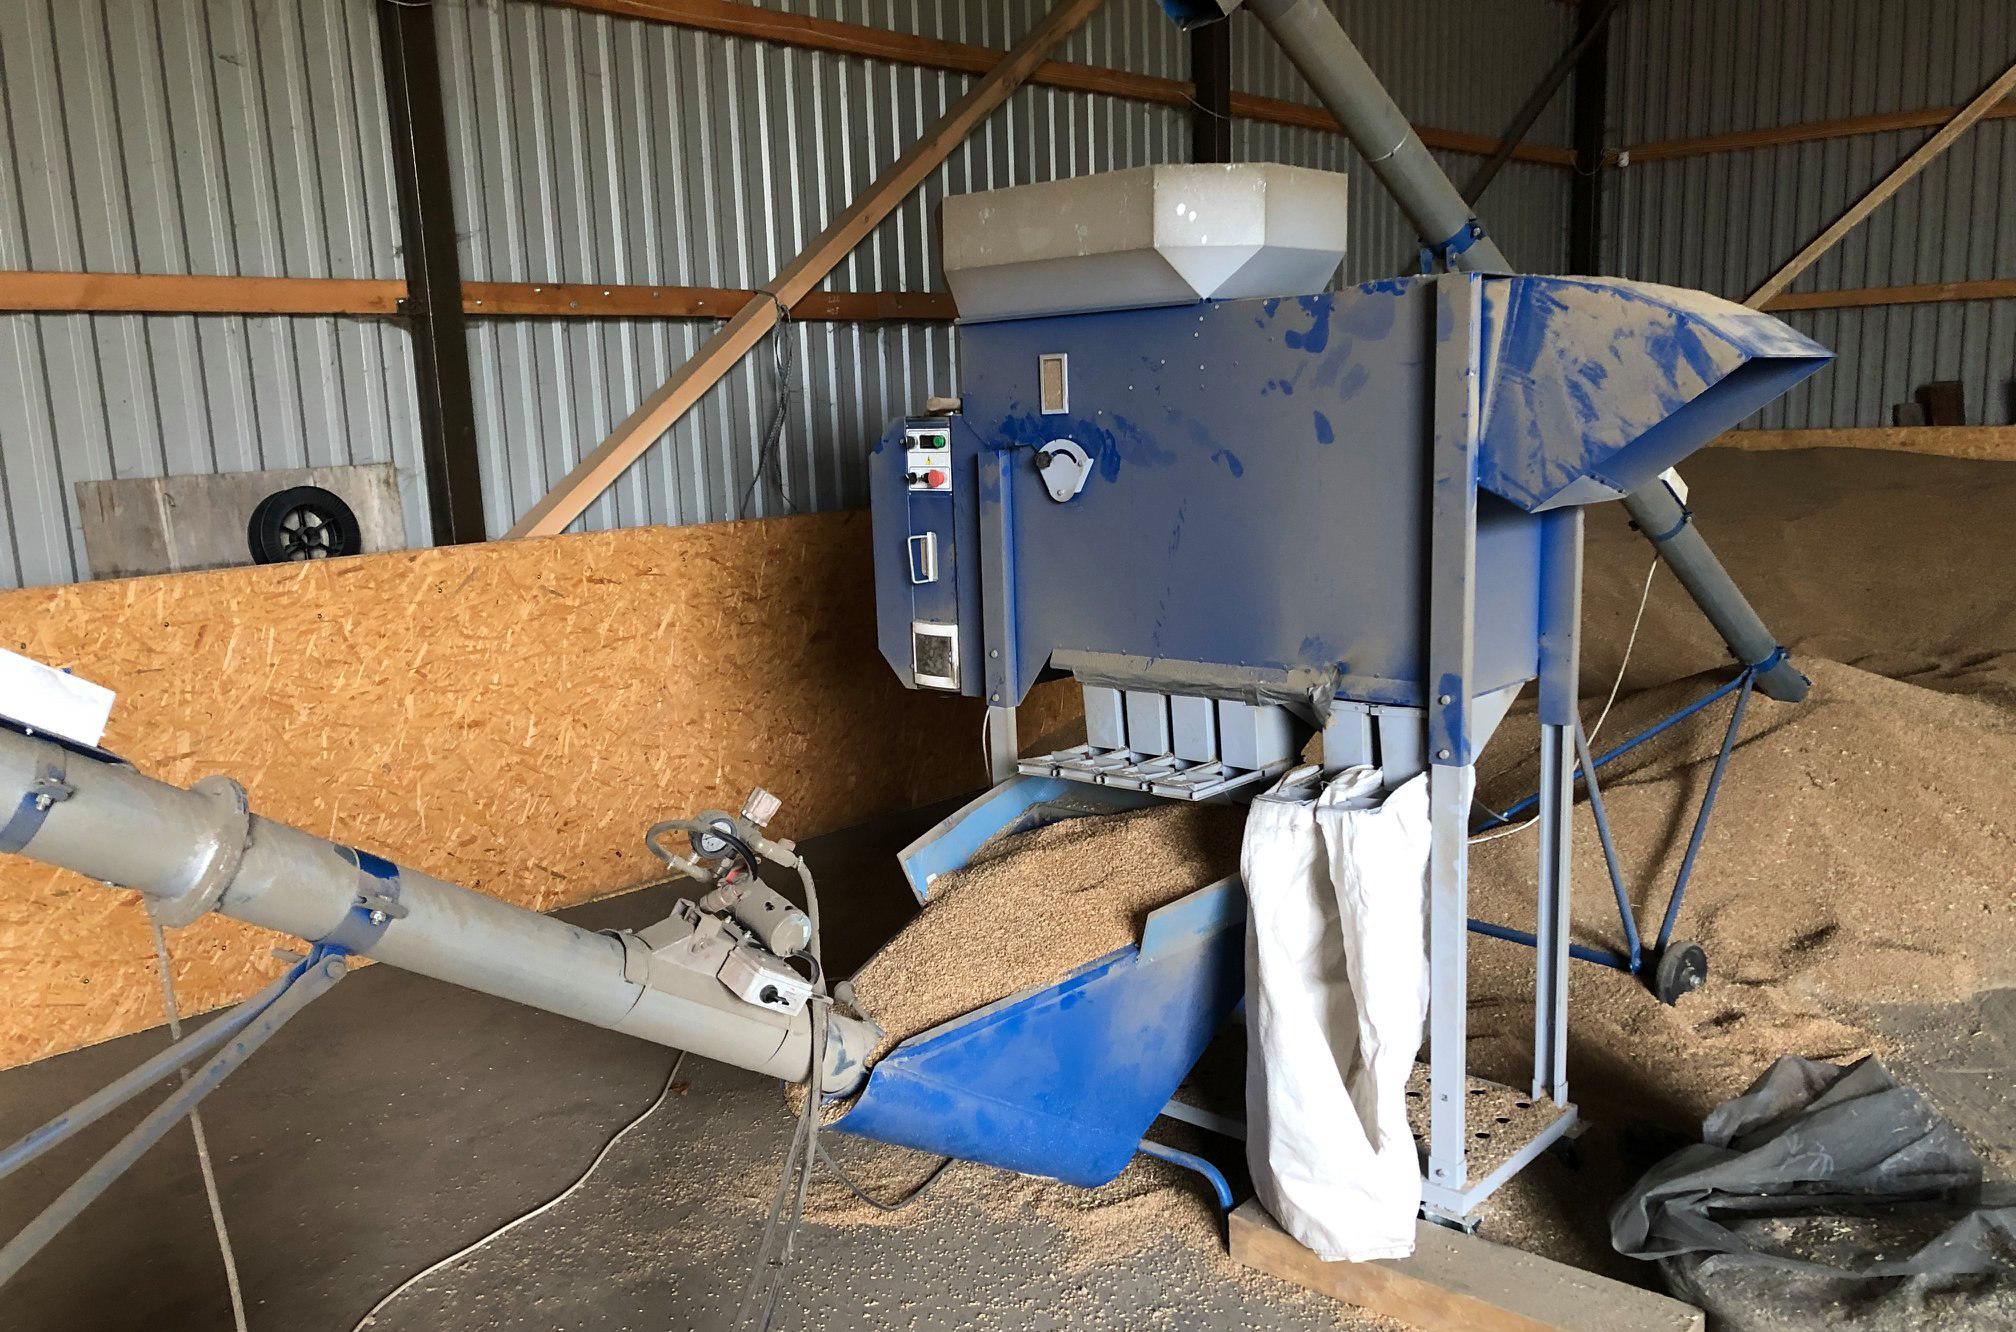 Pulitore Calibratore per Sementi e Cereali ASM 5 t/h in vendita - foto 3